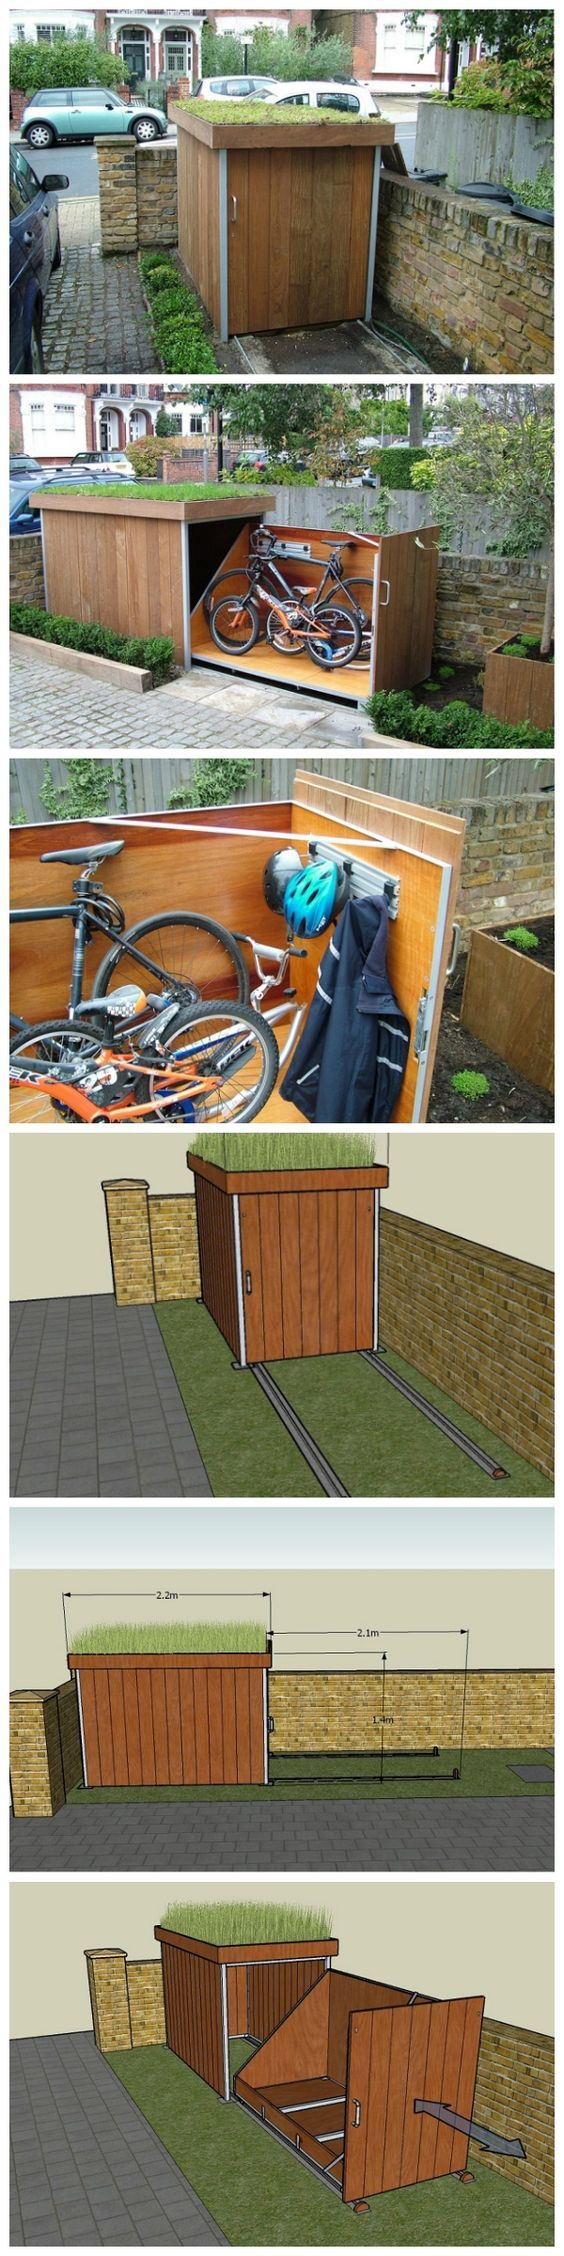 How To Build A Bike Storage Shed: